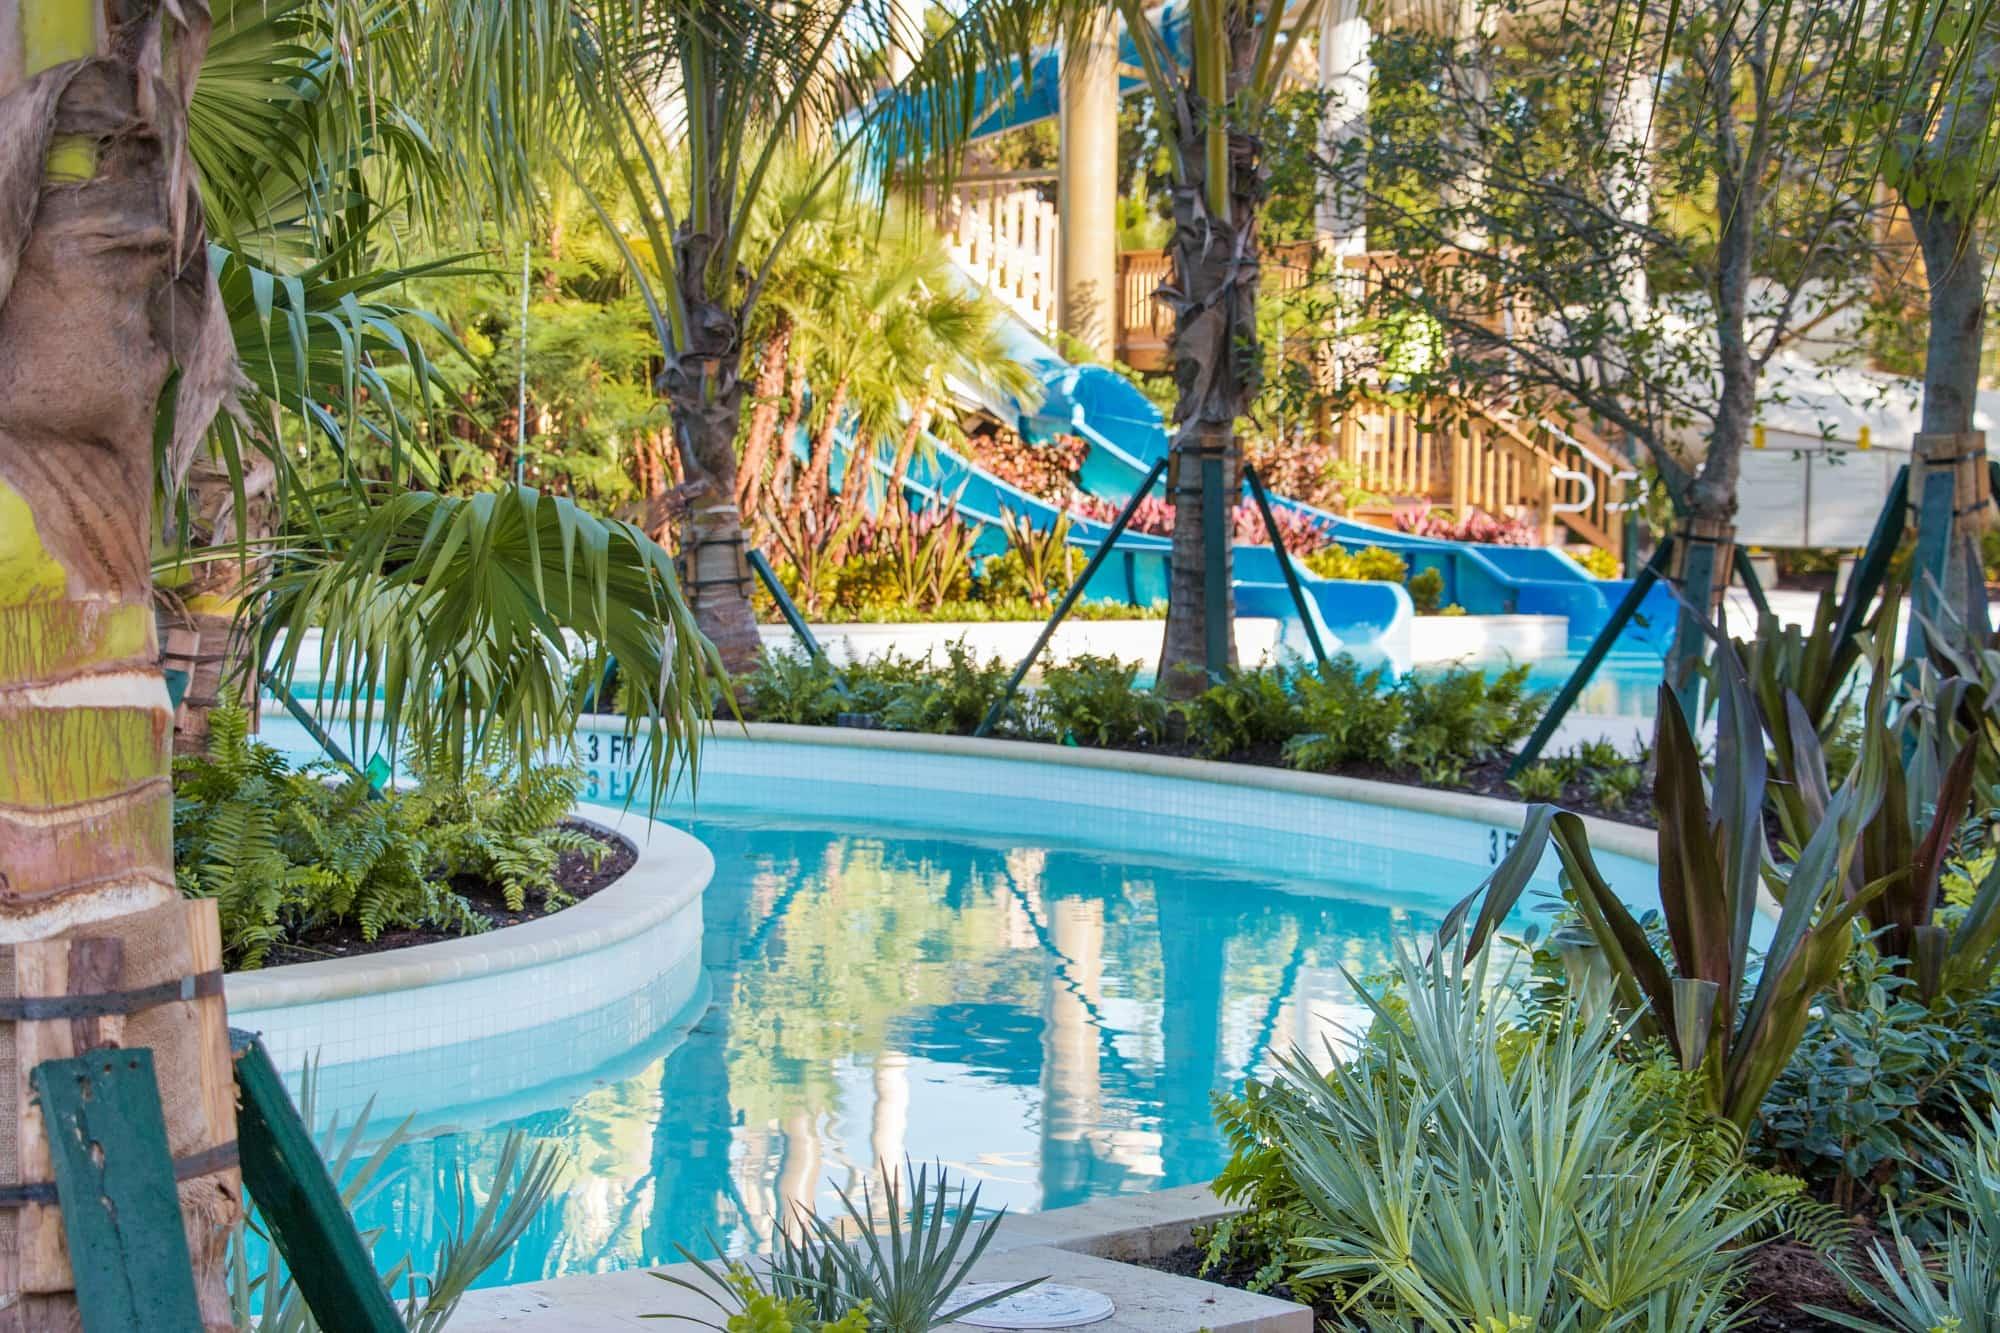 Hyatt Regency Coconut Point's lazy river ~ Best Hotels with Lazy Rivers